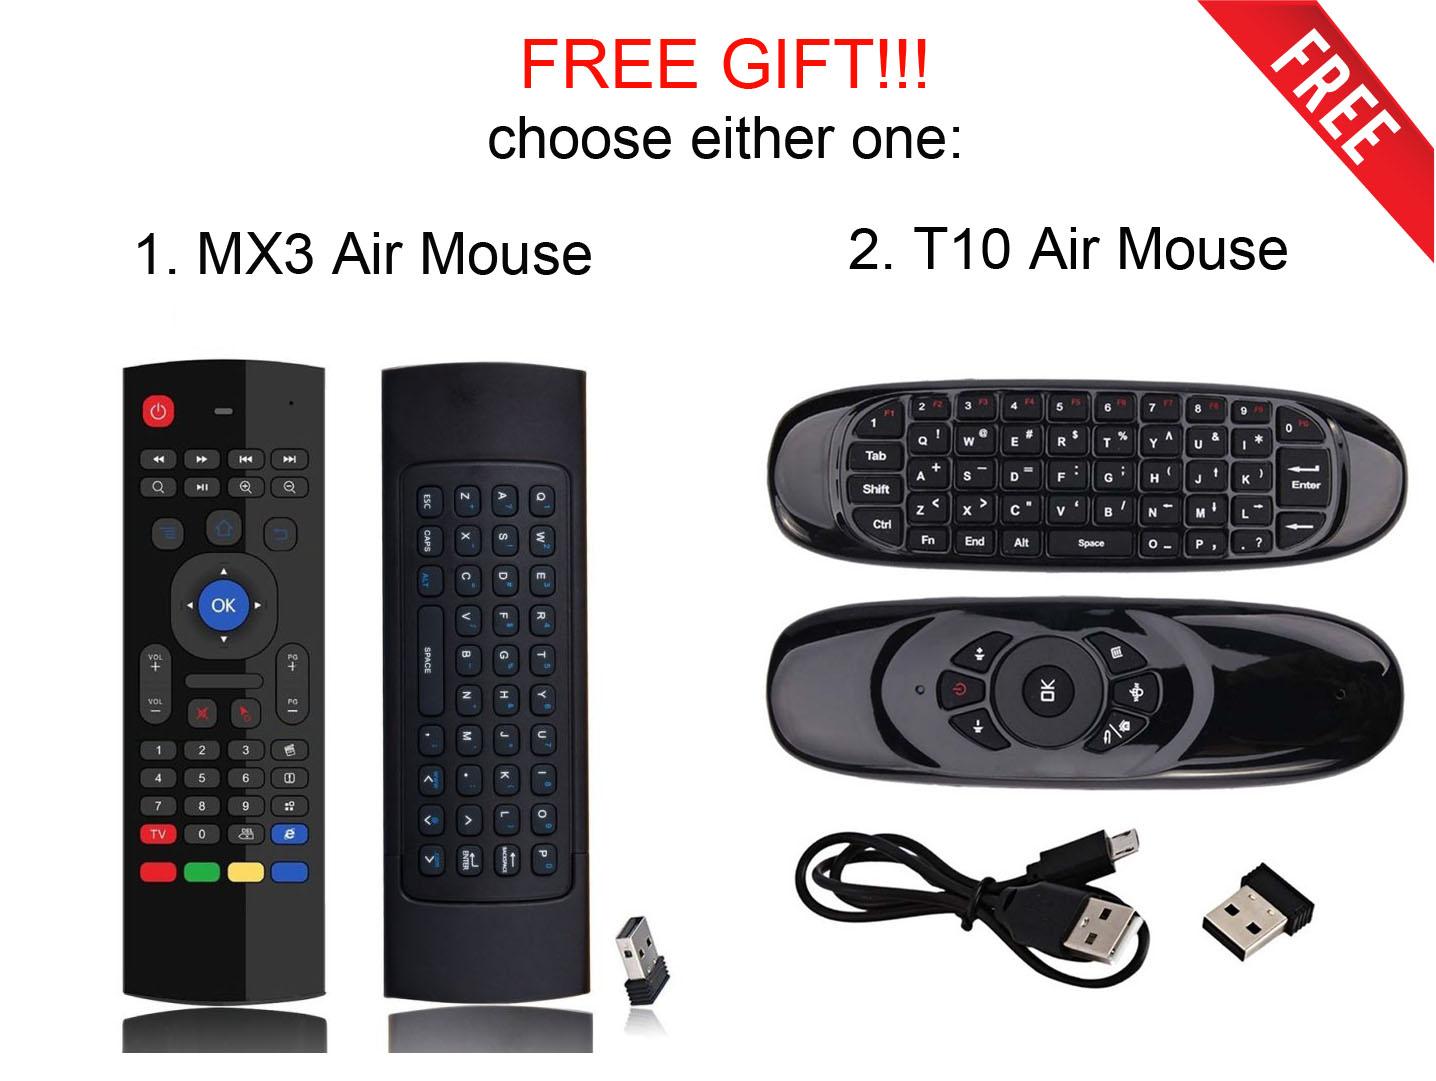 EVPAD 2S PRO + PLUS Android TV Box Lifetime Free IPTV 1 Yr Warranty